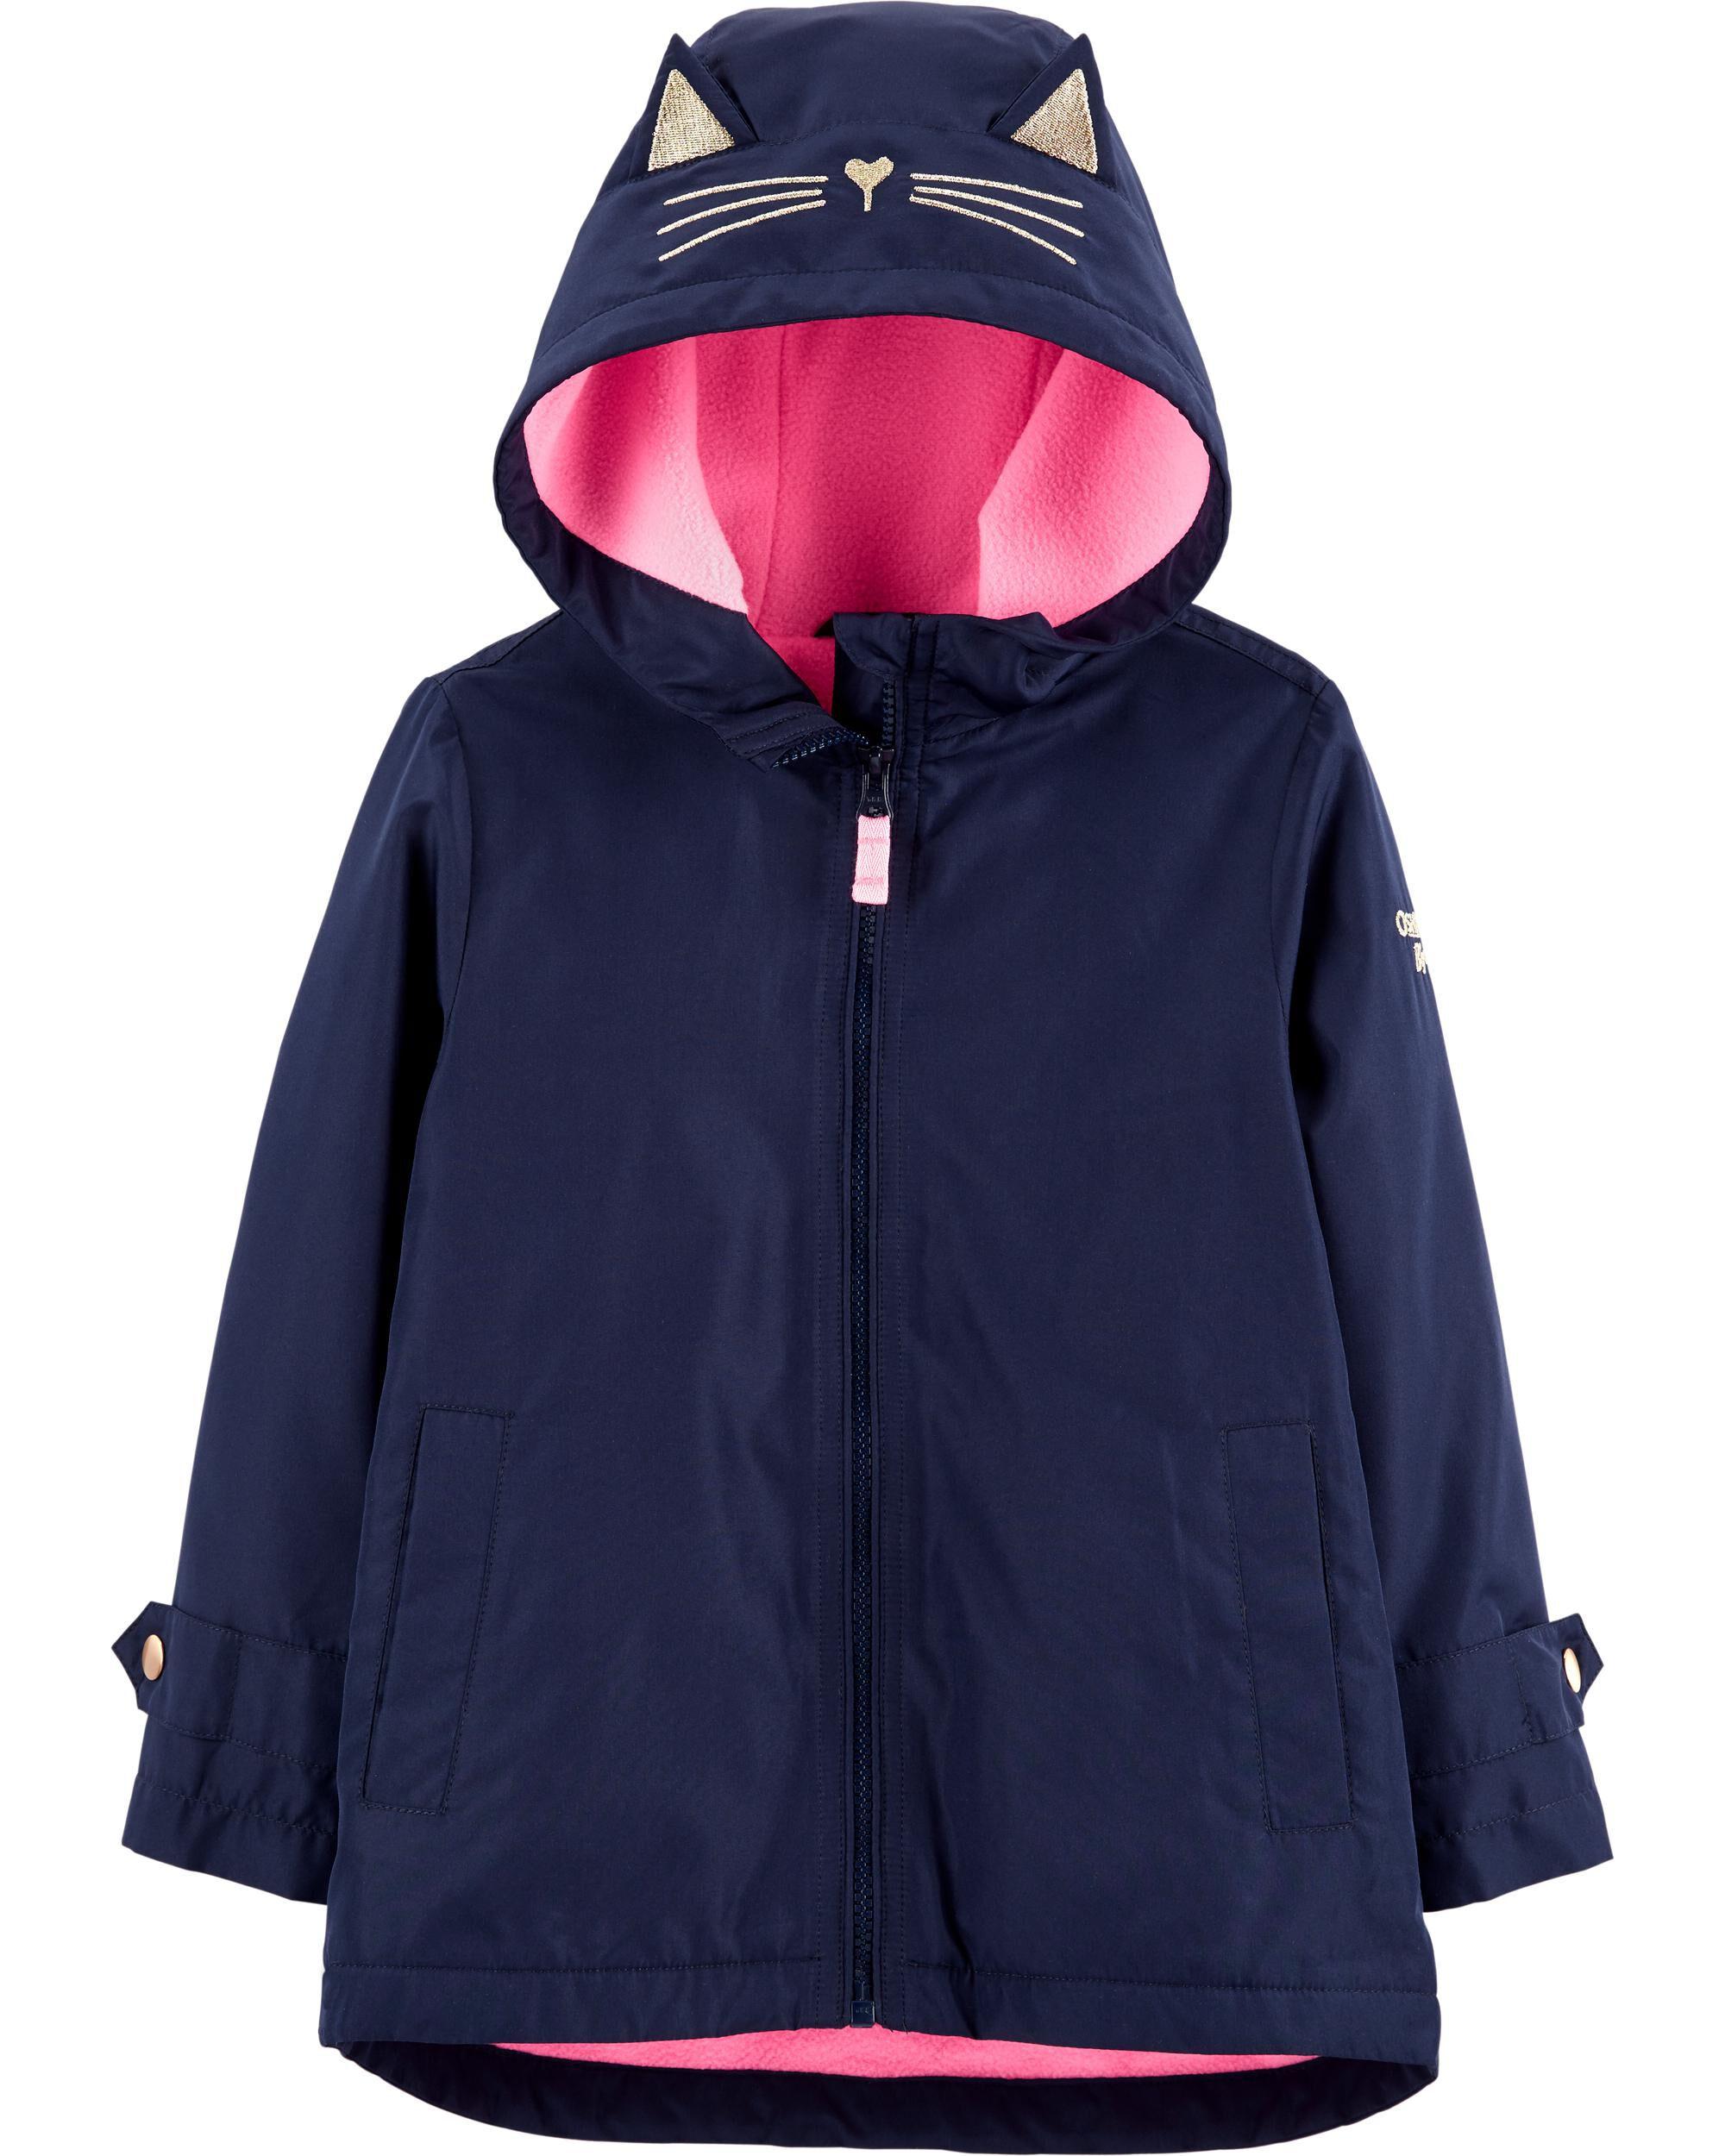 New Fashion Oshkosh B'gosh Girls Size 18 M Bib Overall Lined Snow Ski Winter Pants Pink Polk Cheap Sales Baby & Toddler Clothing